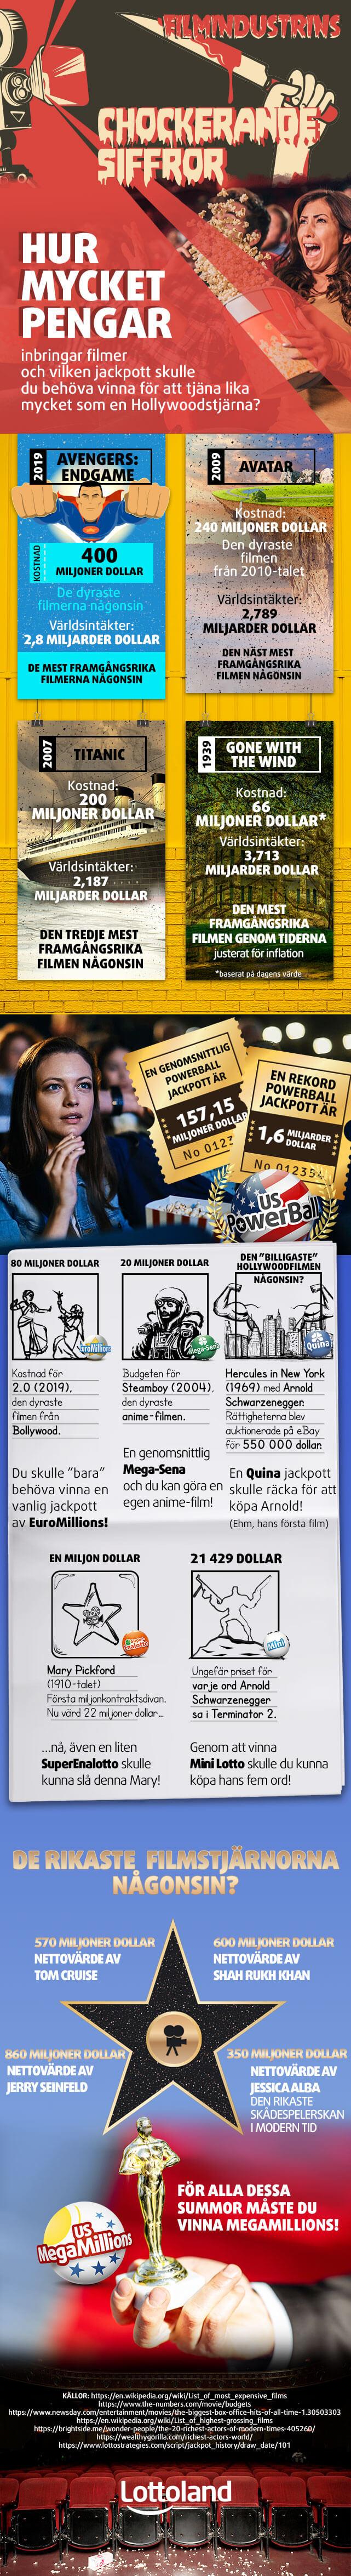 Filmindustrins - Chockerande siffror